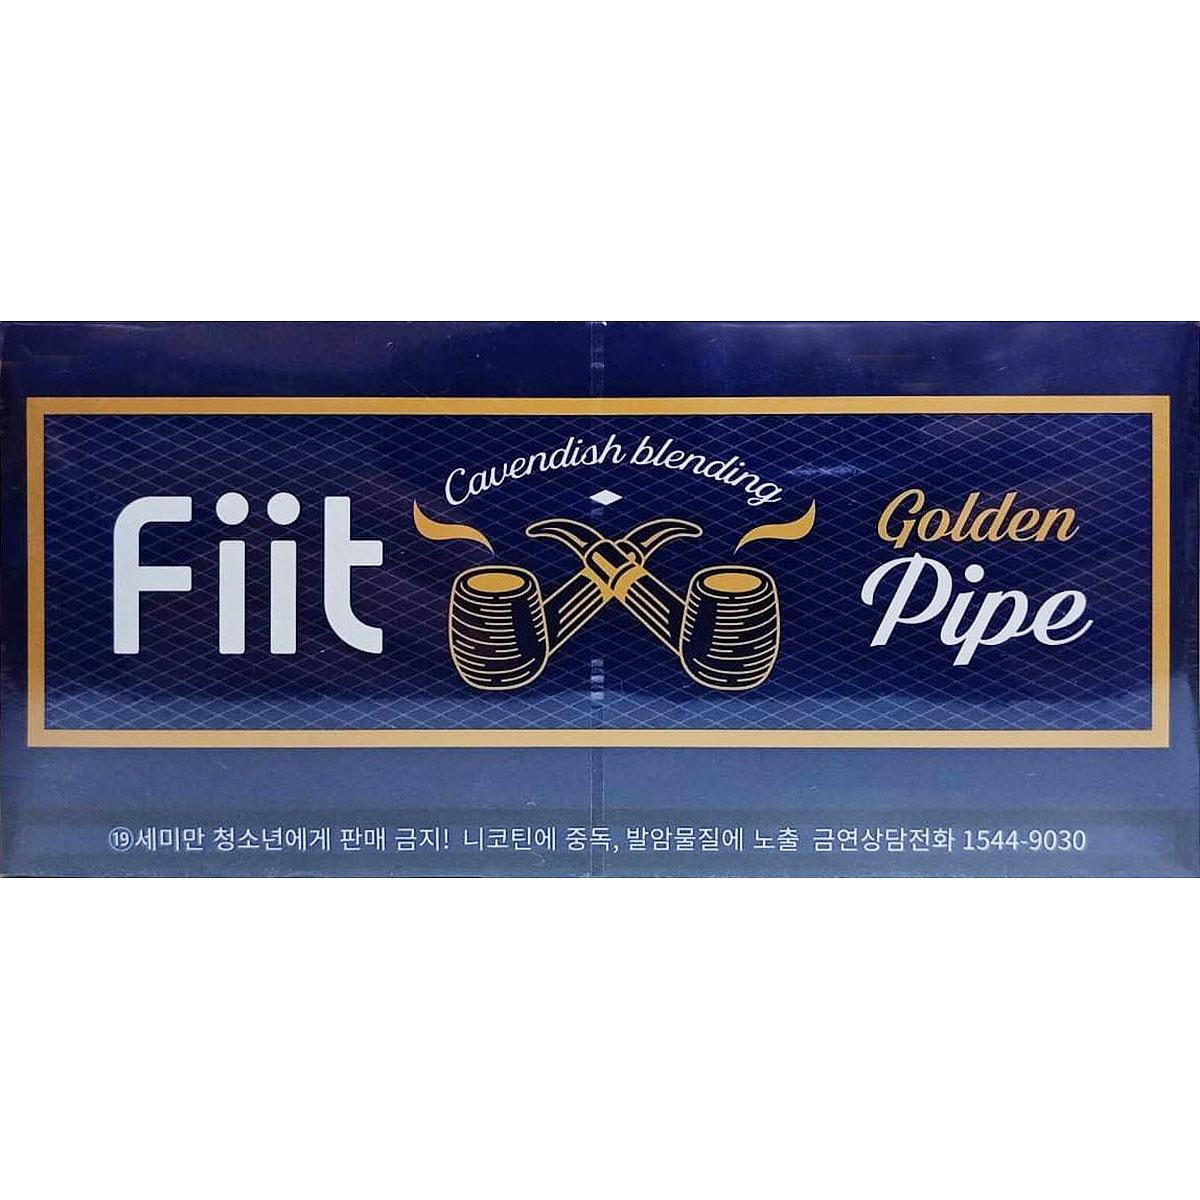 Fiit - Golden Pipe